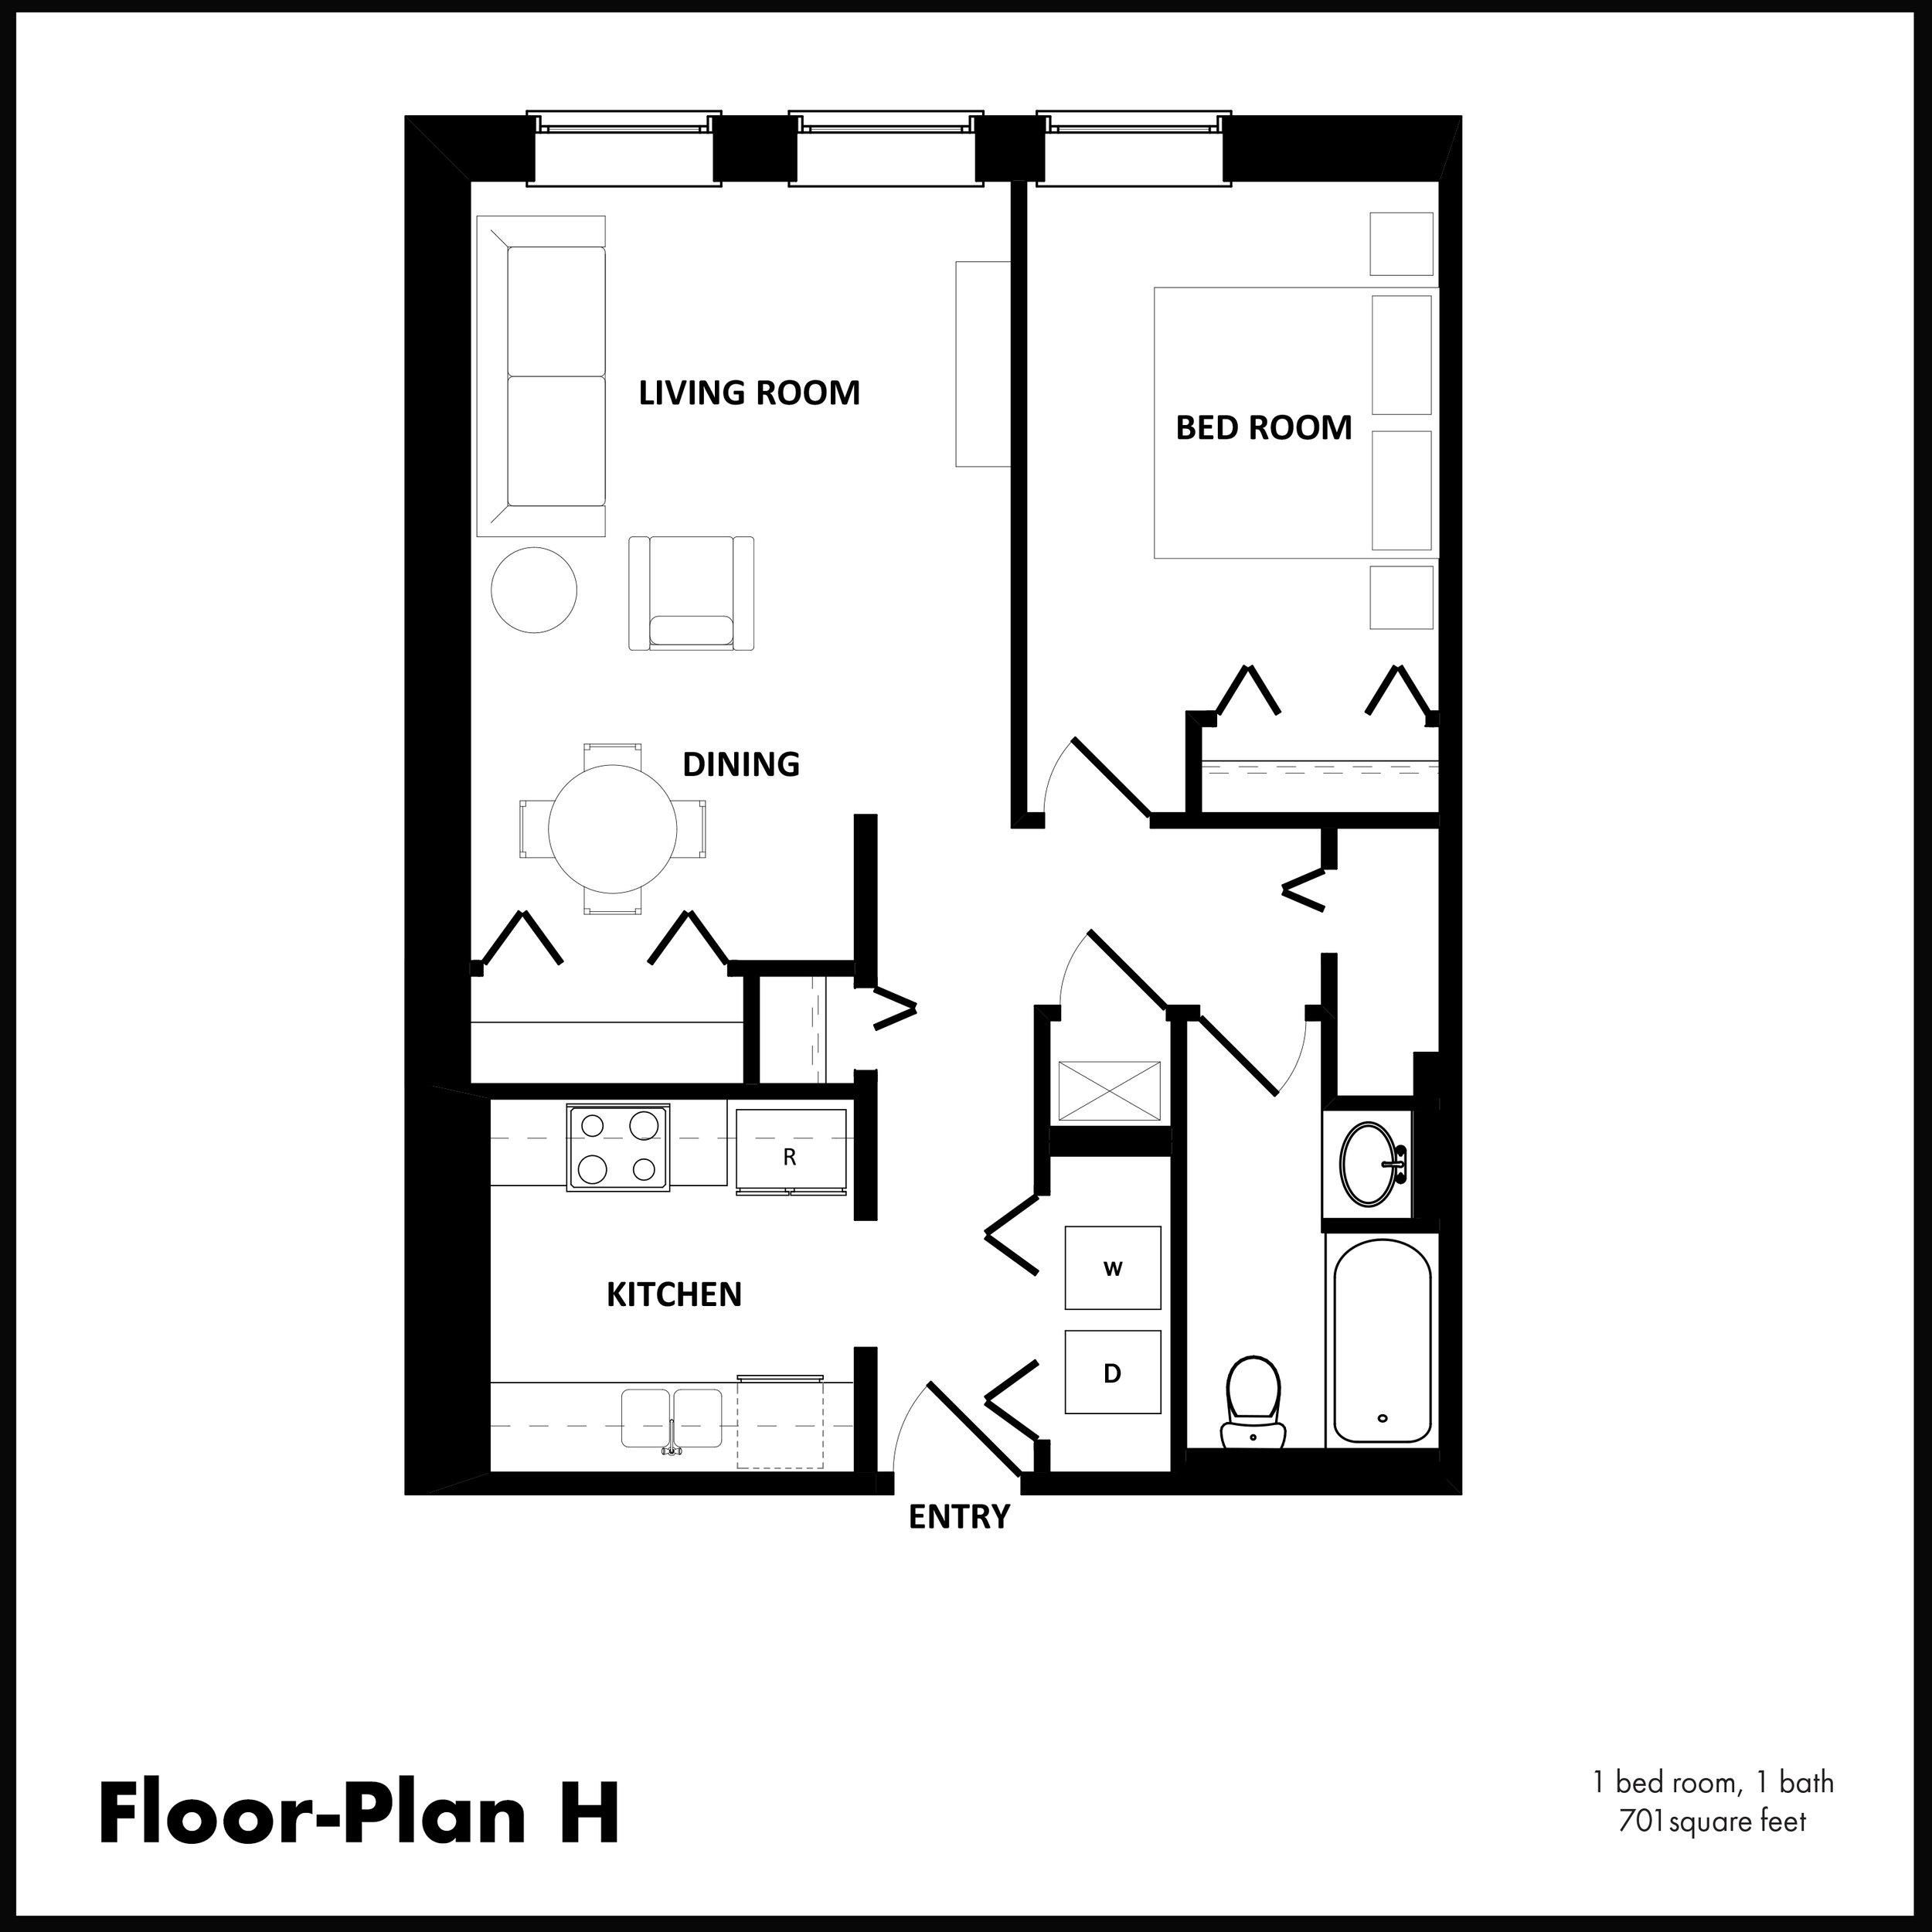 floor plan H.jpg